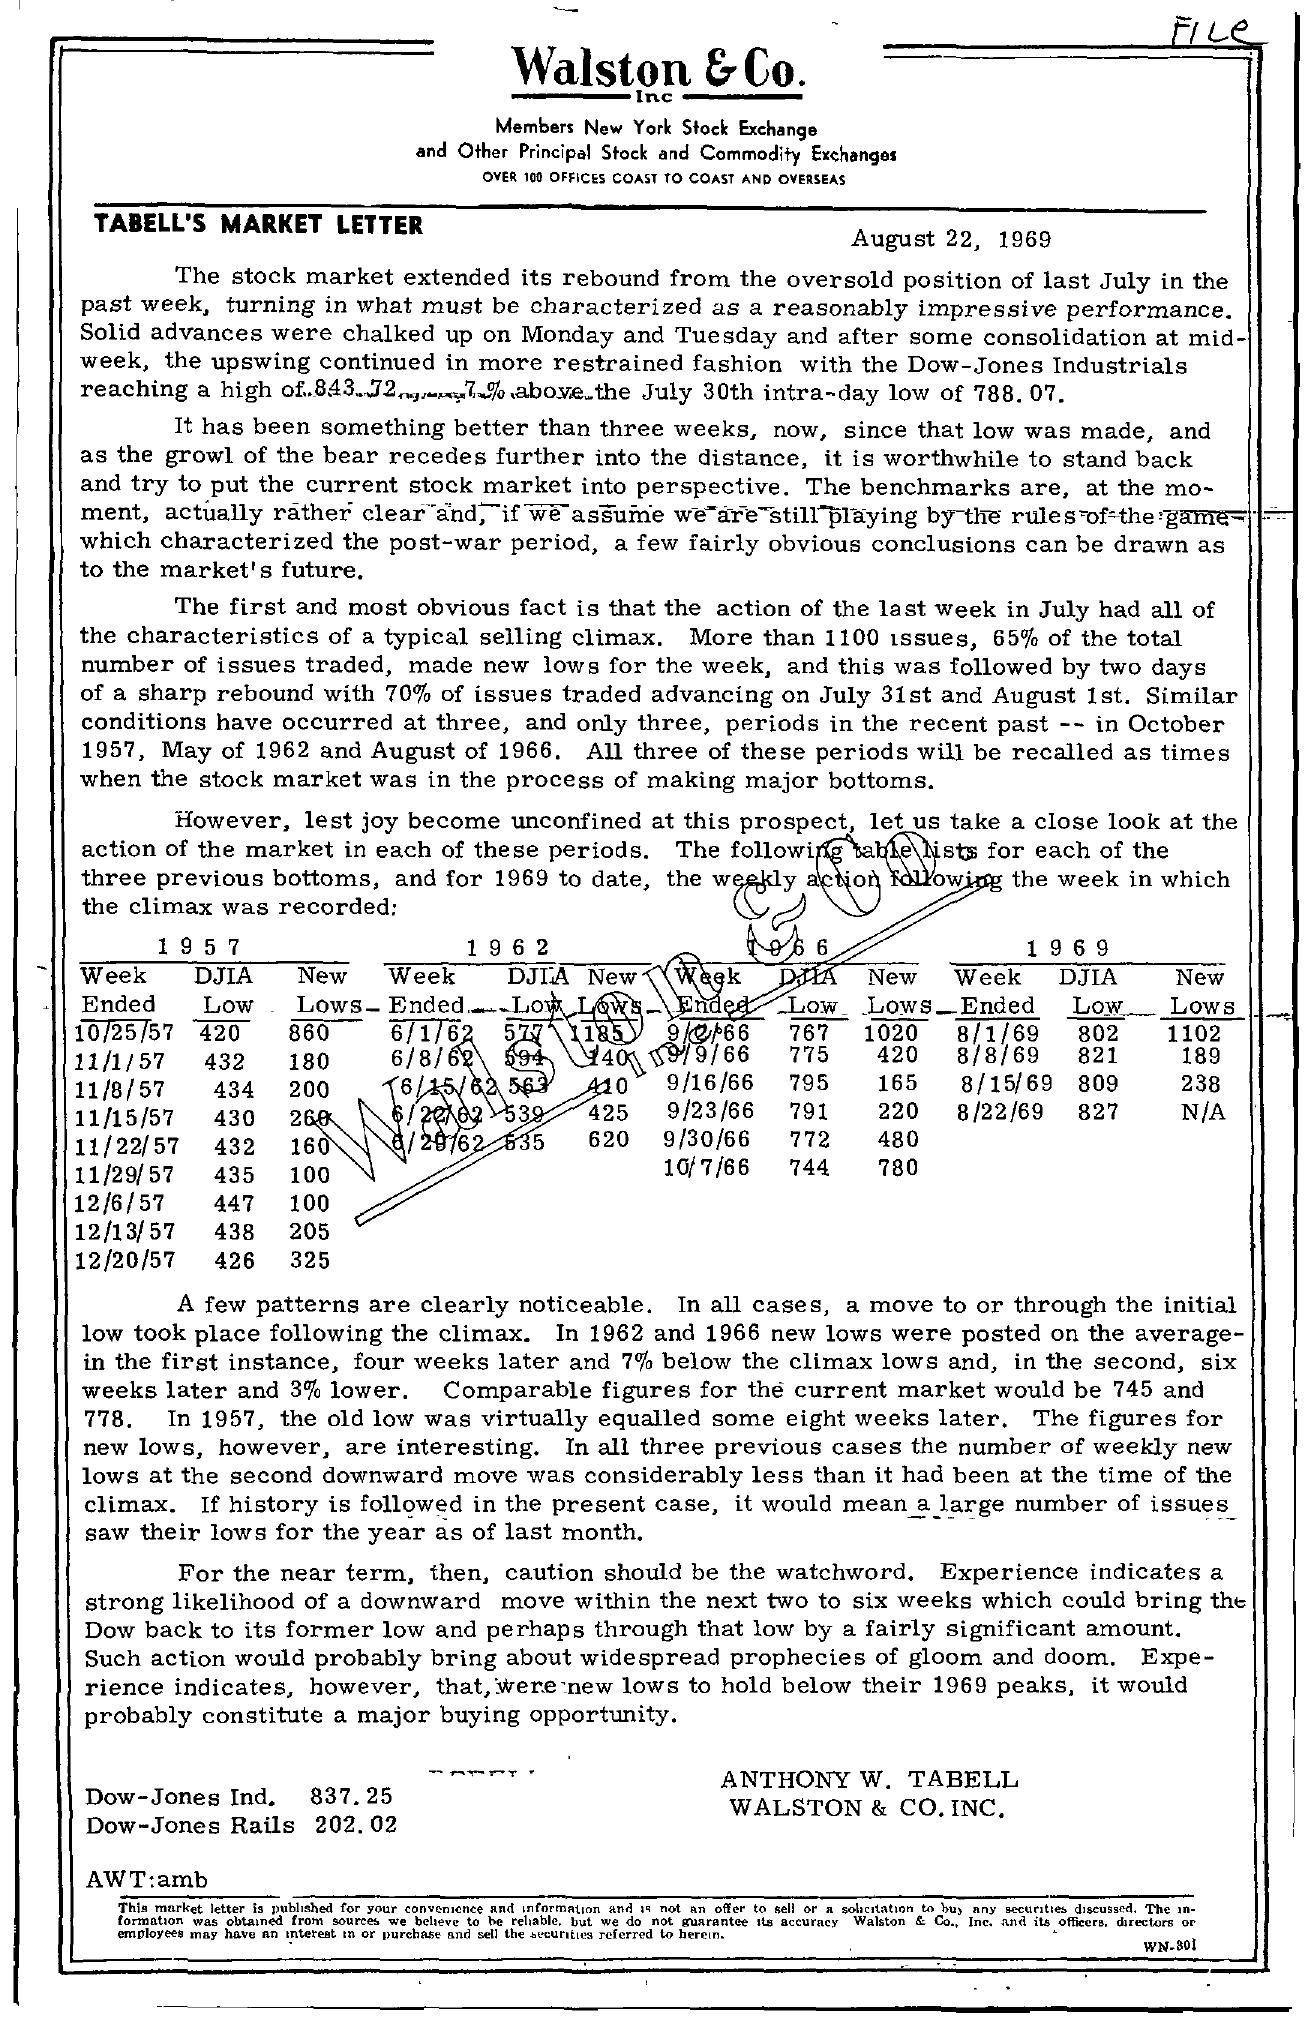 Tabell's Market Letter - August 22, 1969